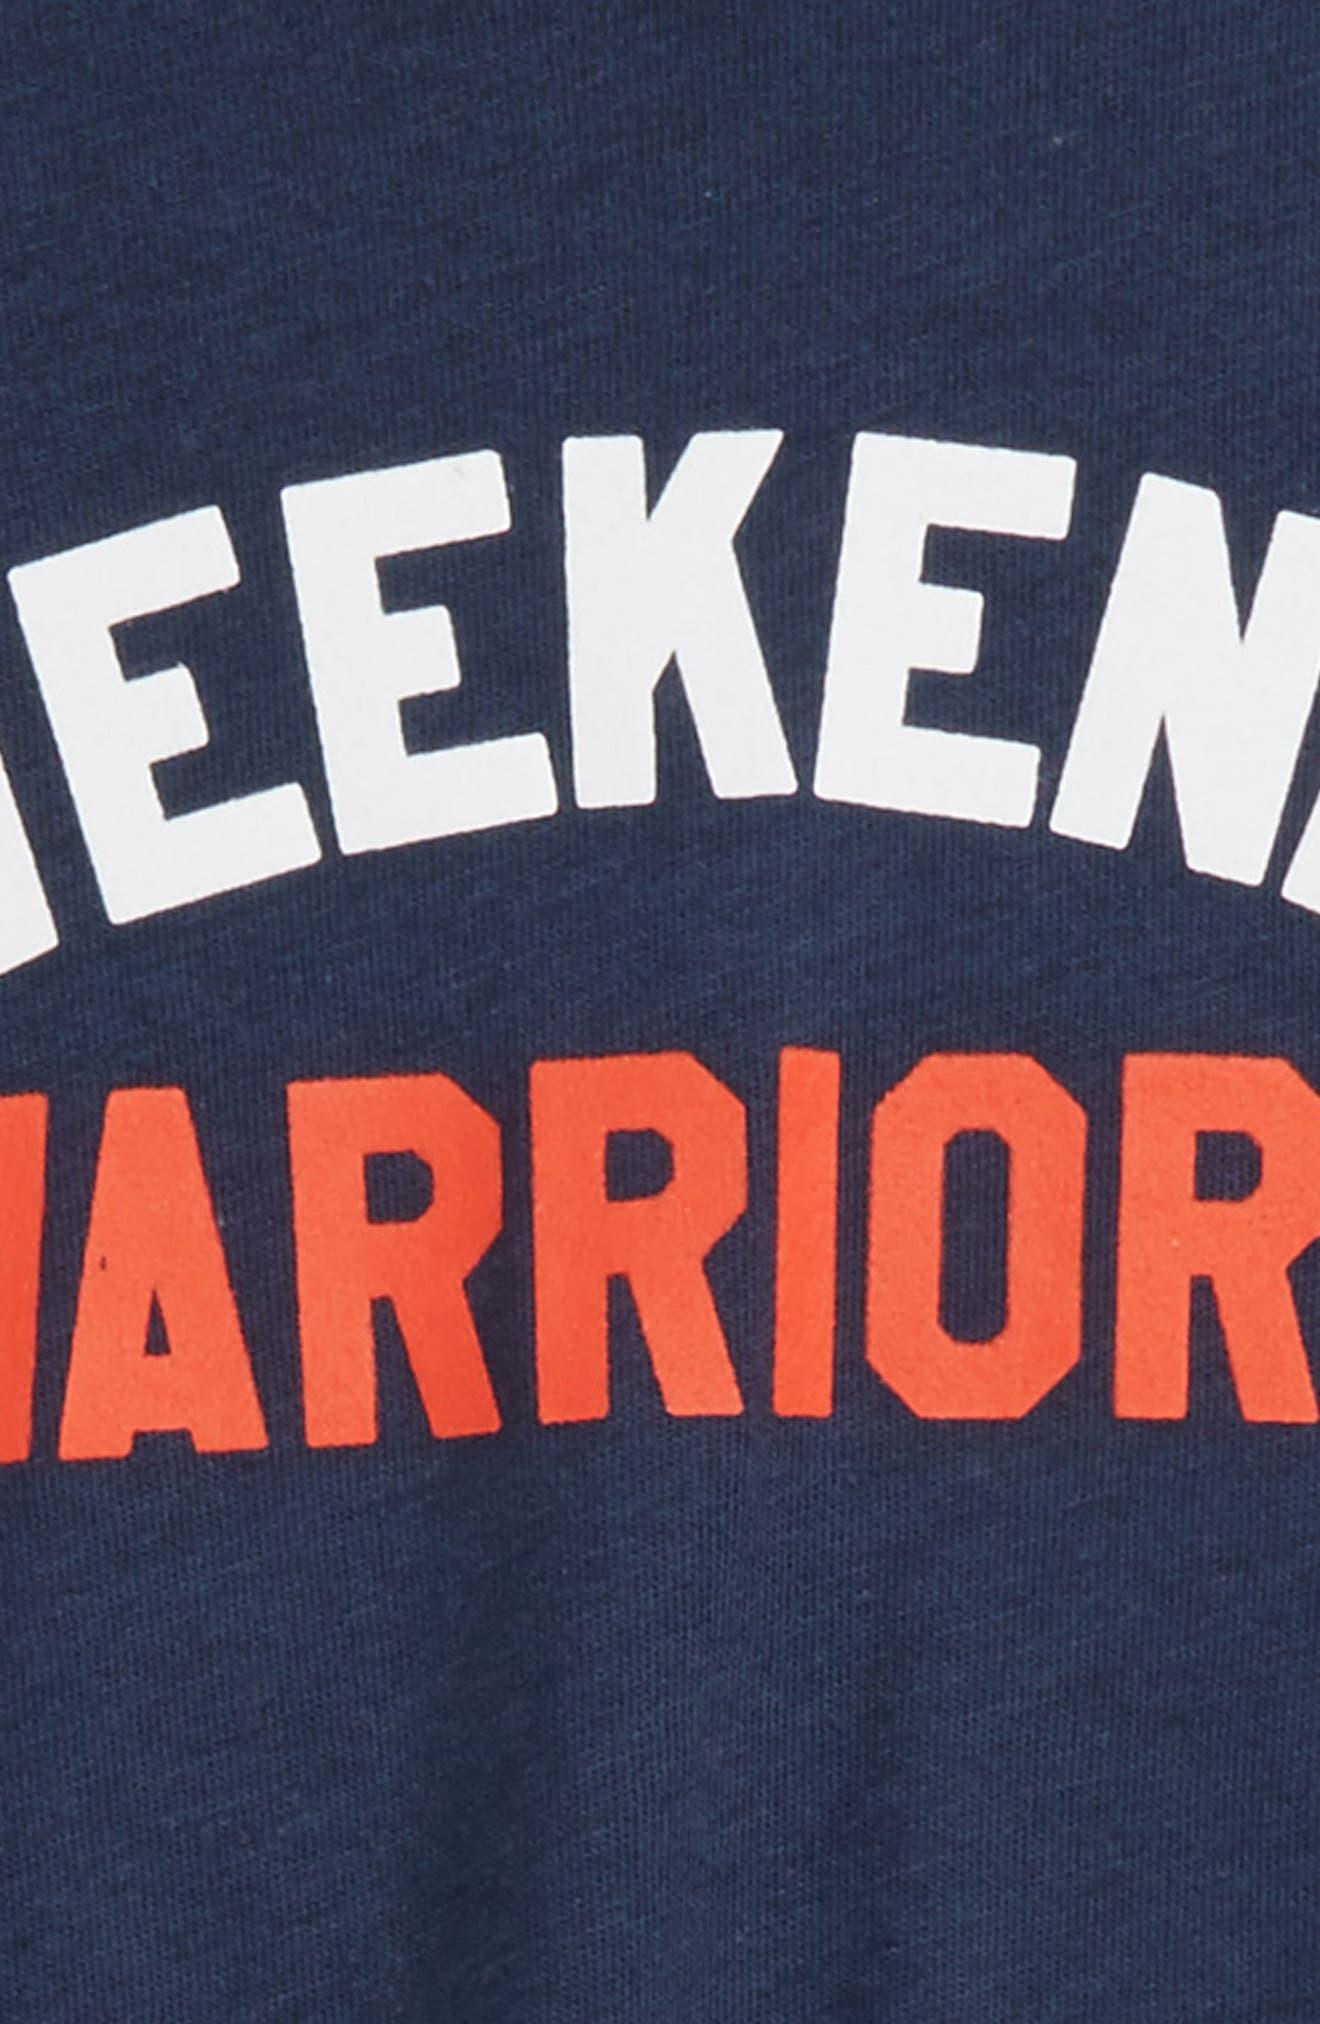 Weekend Warriors Tee,                             Alternate thumbnail 3, color,